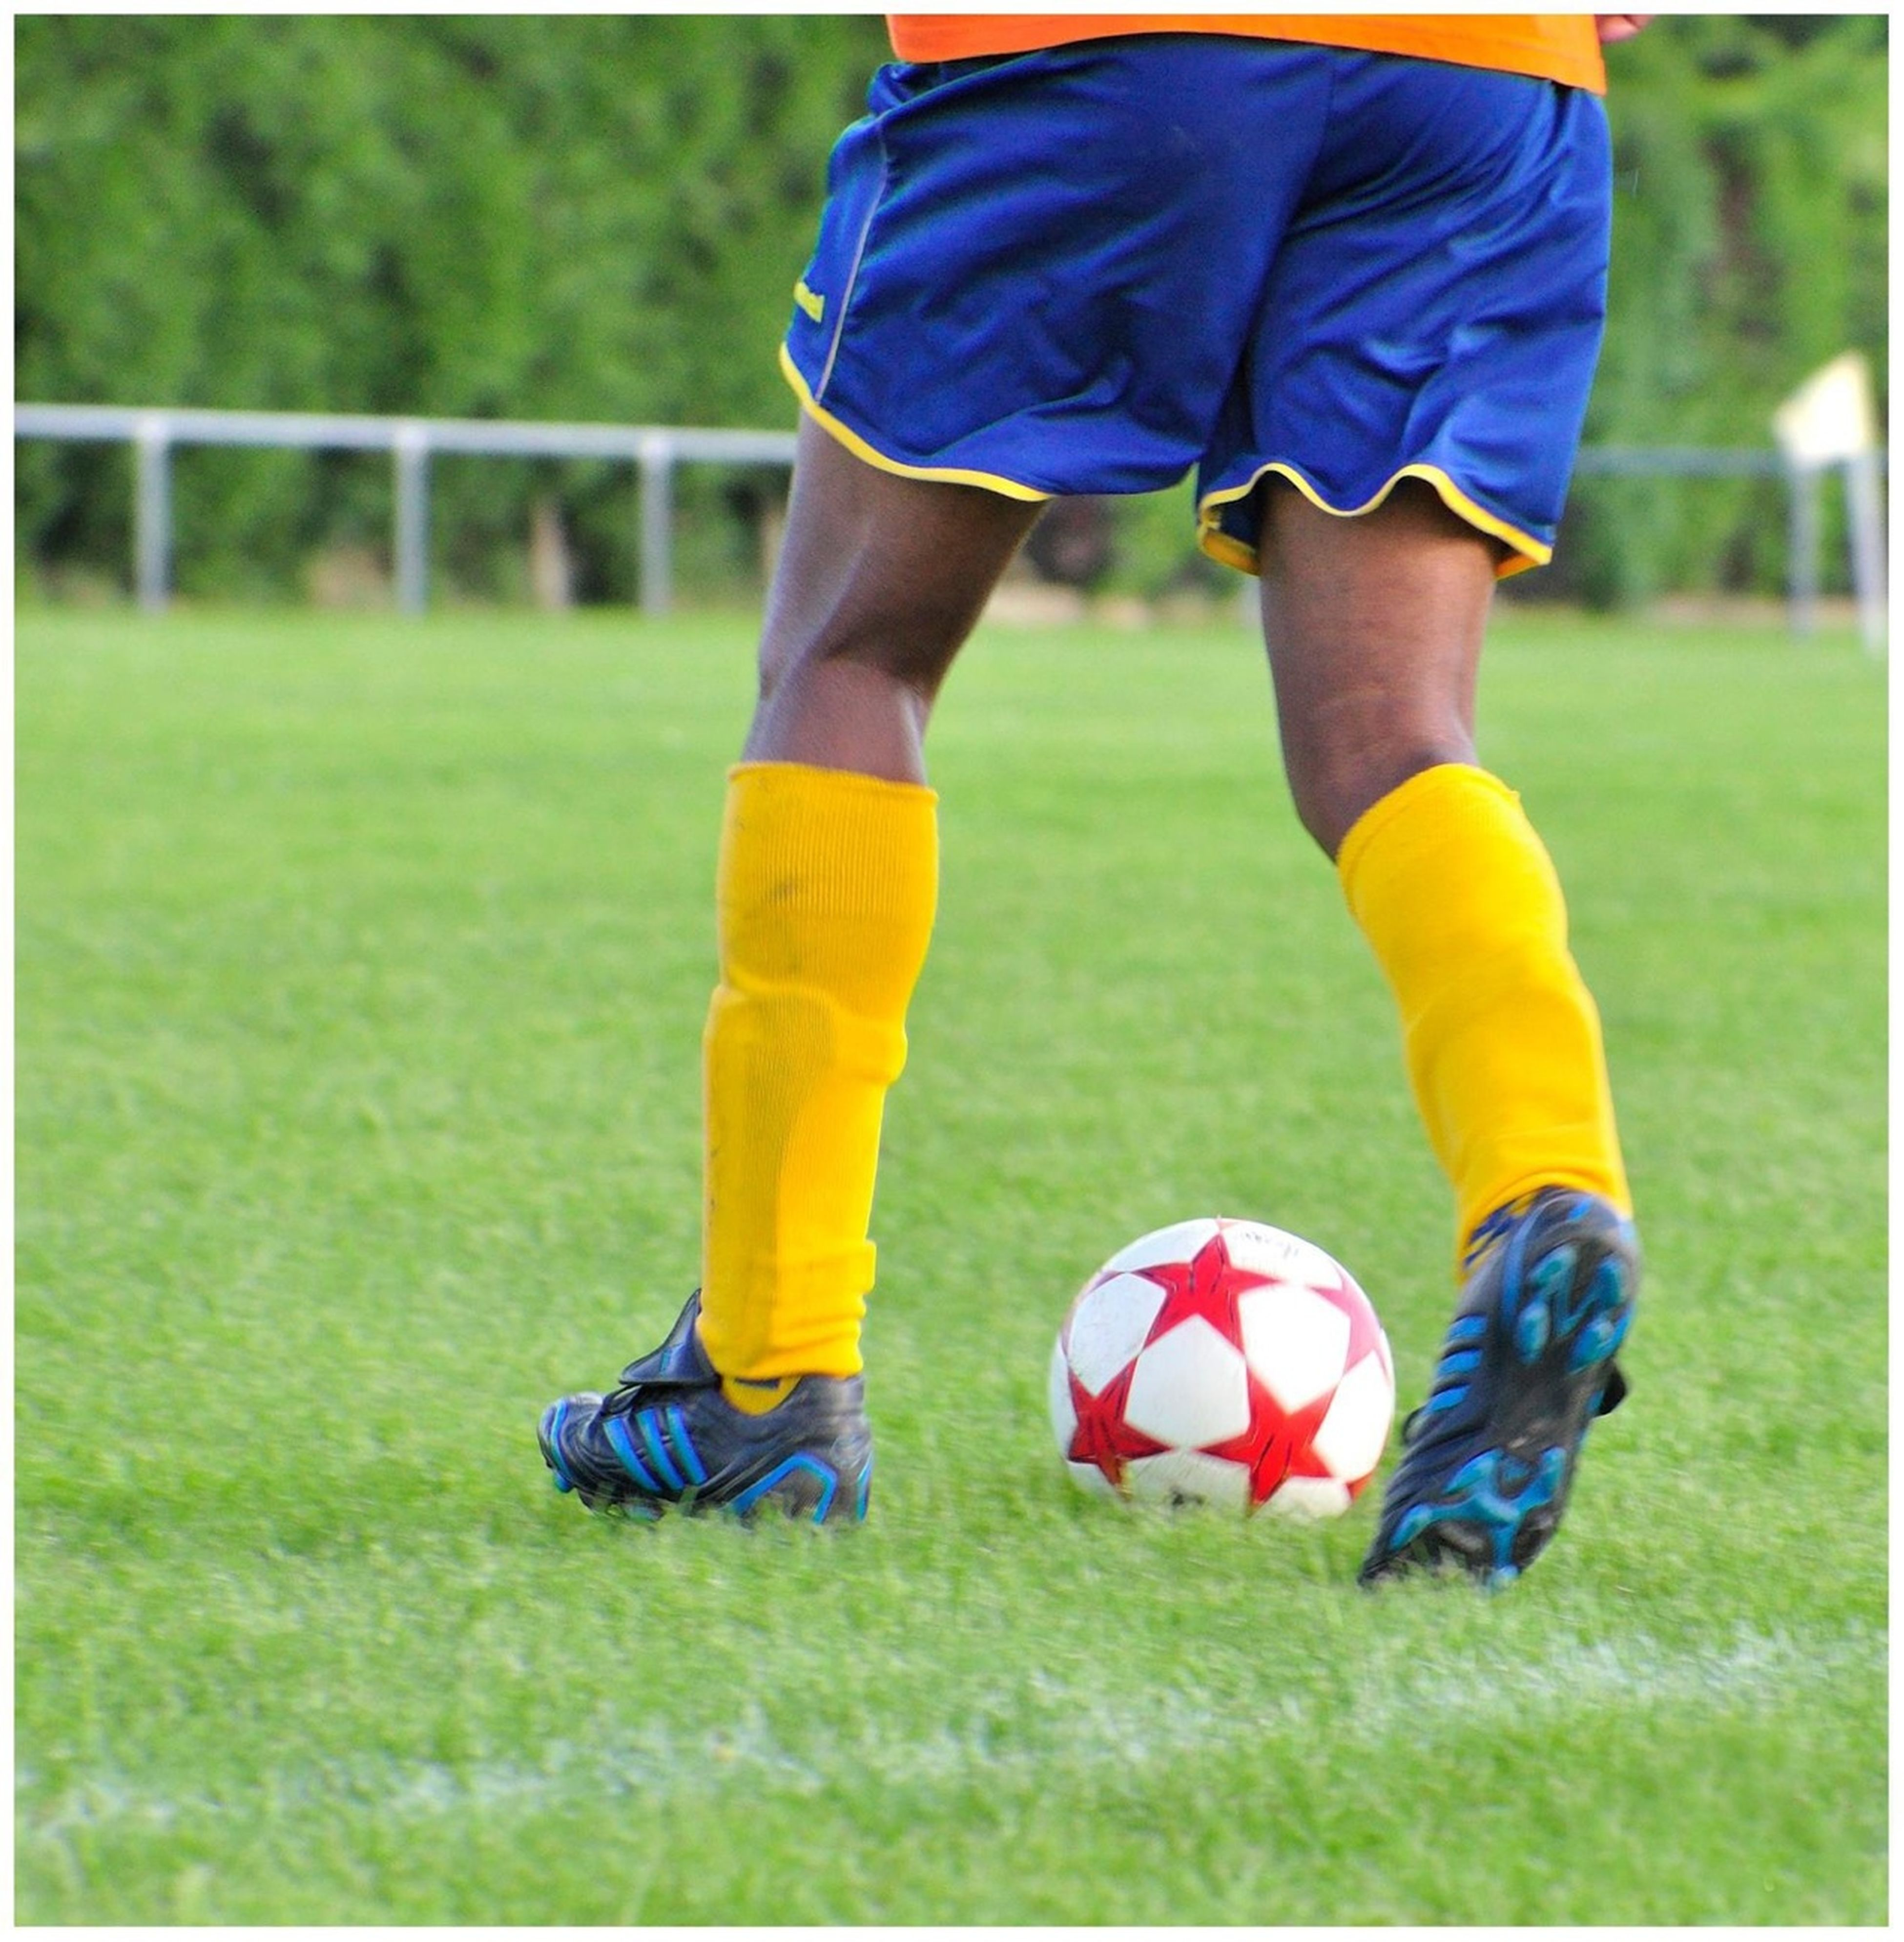 Photo taken with my Nikon d5000. Football Taking Photos Enjoying Life Eye4photography